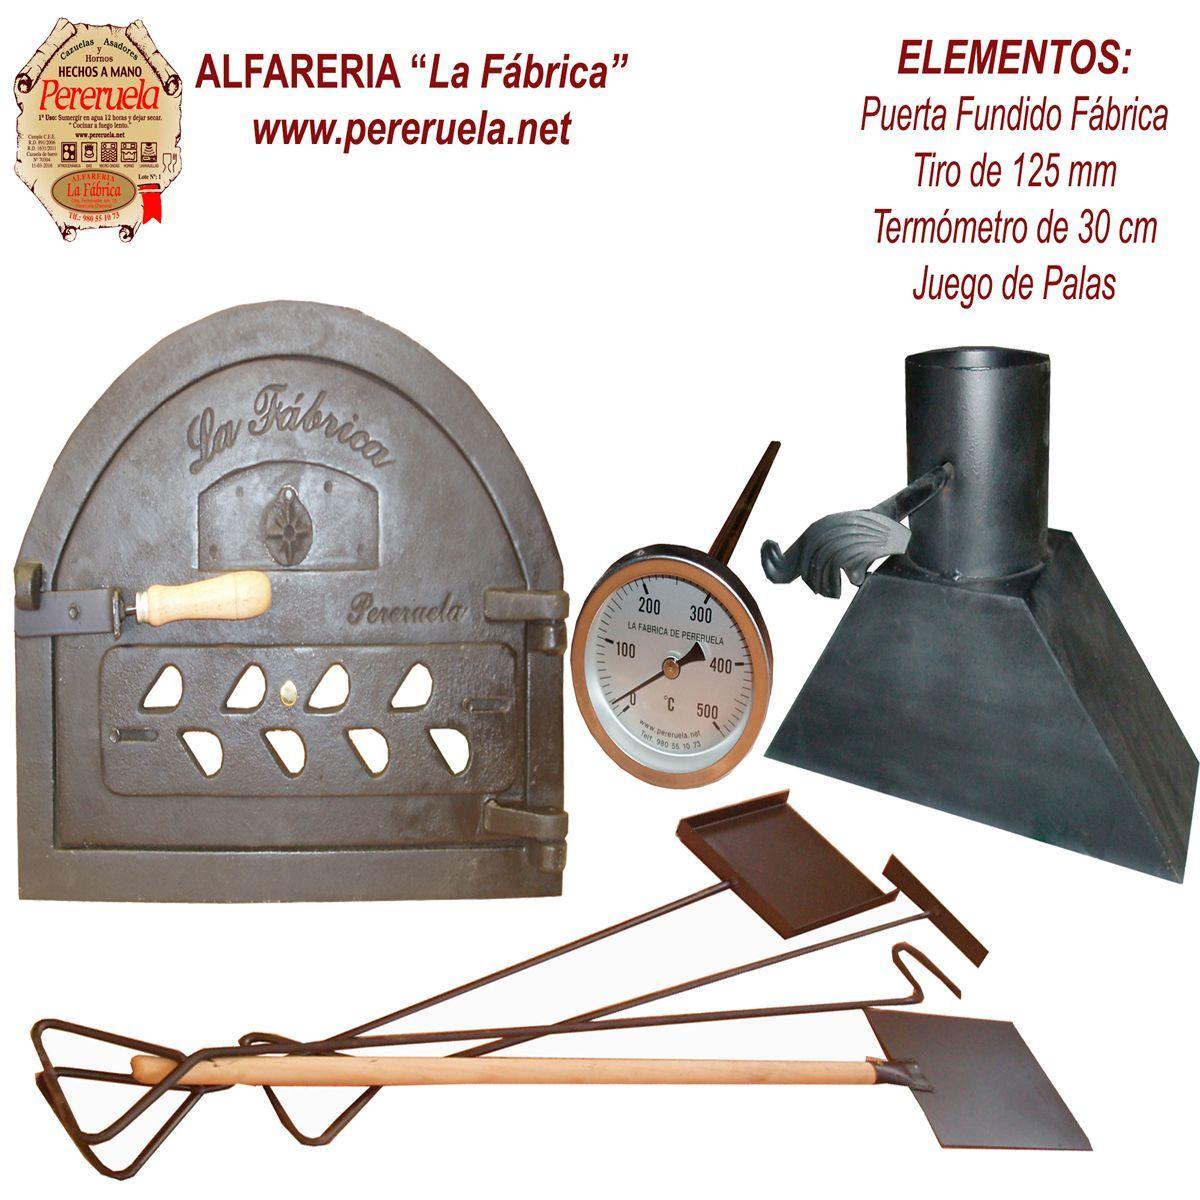 Conjunto De Accesorios Para Horno De Lena Puerta Hierro Fundido Fabrica Horno De Lena Hornos Para Pizzas Hornos Artesanales